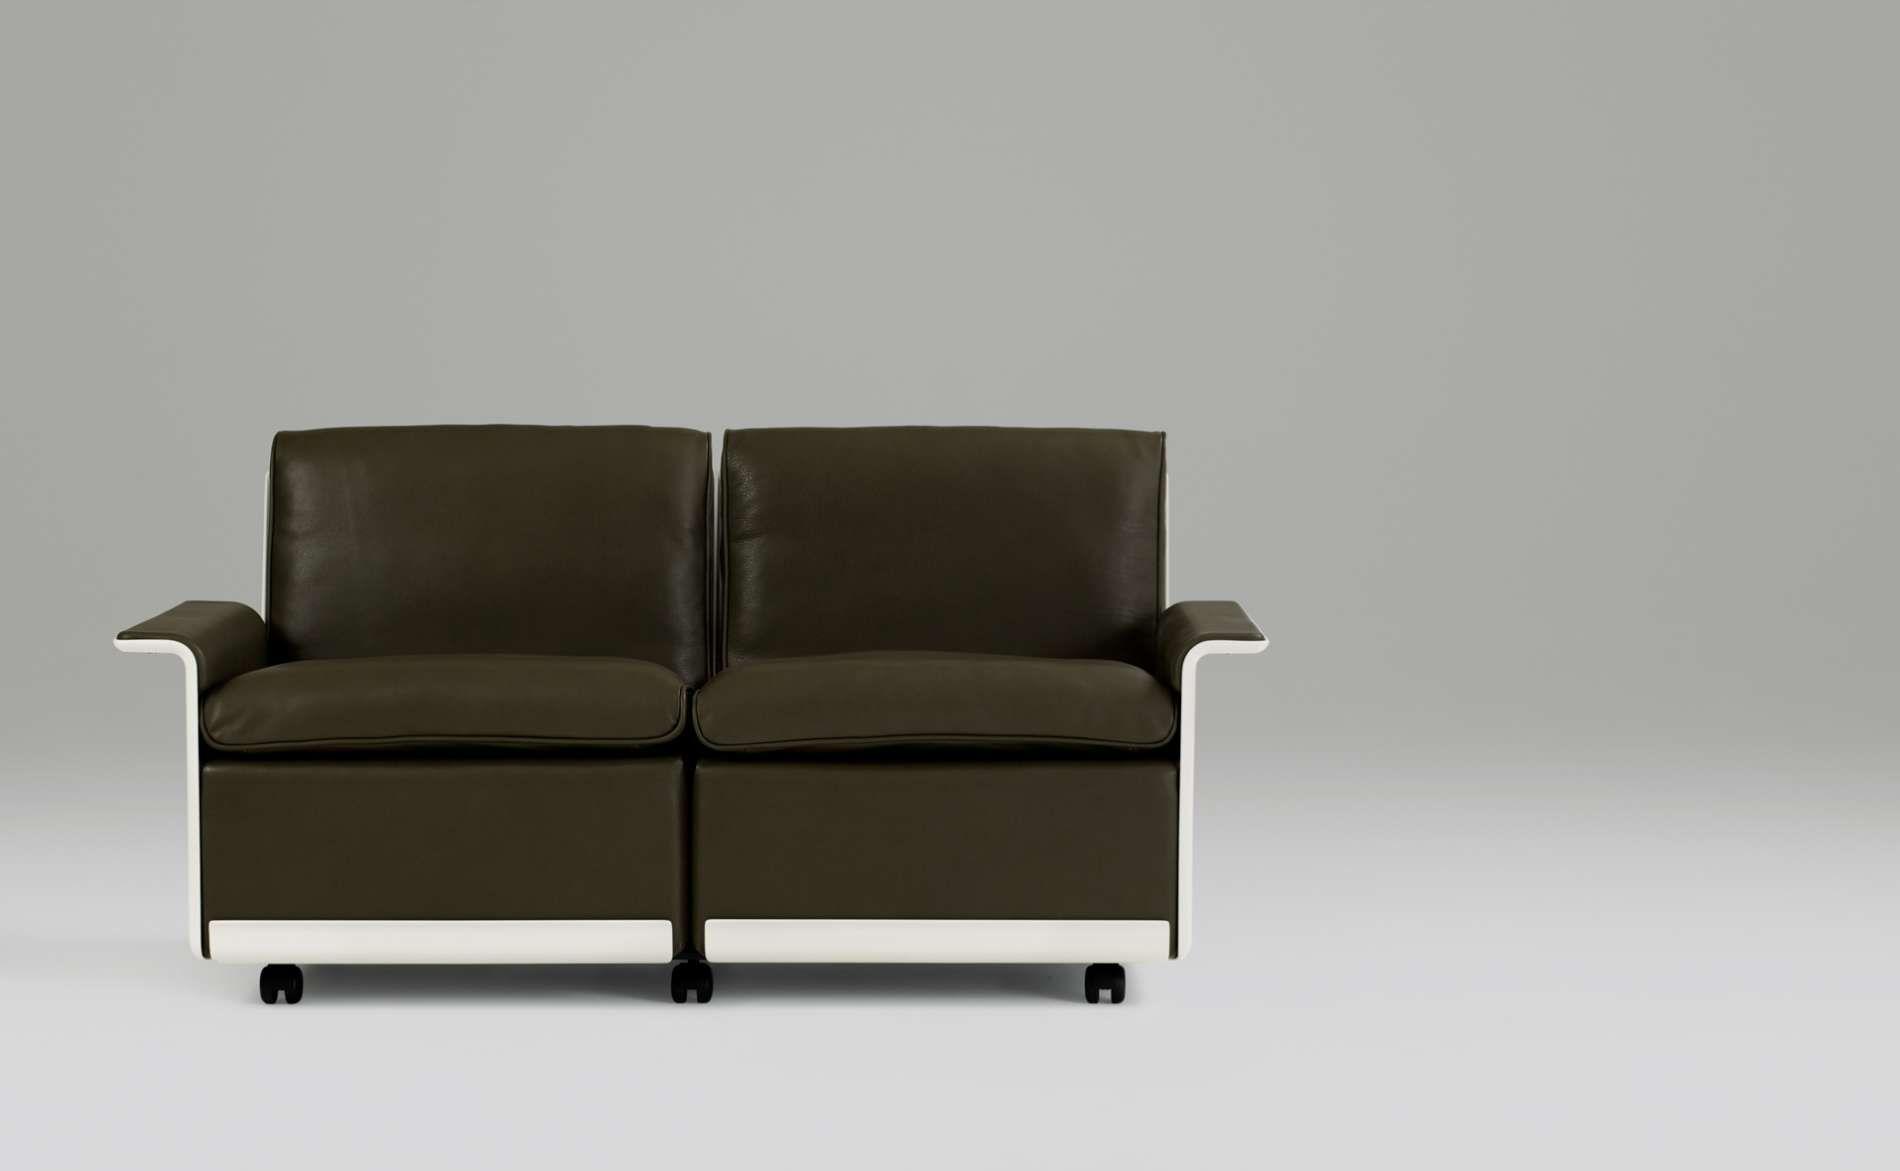 Modernes Mobilar · Industriedesign · Mitte Des Jahrhunderts · Sofa · The  620 Modular Chair By Dieter Rams .